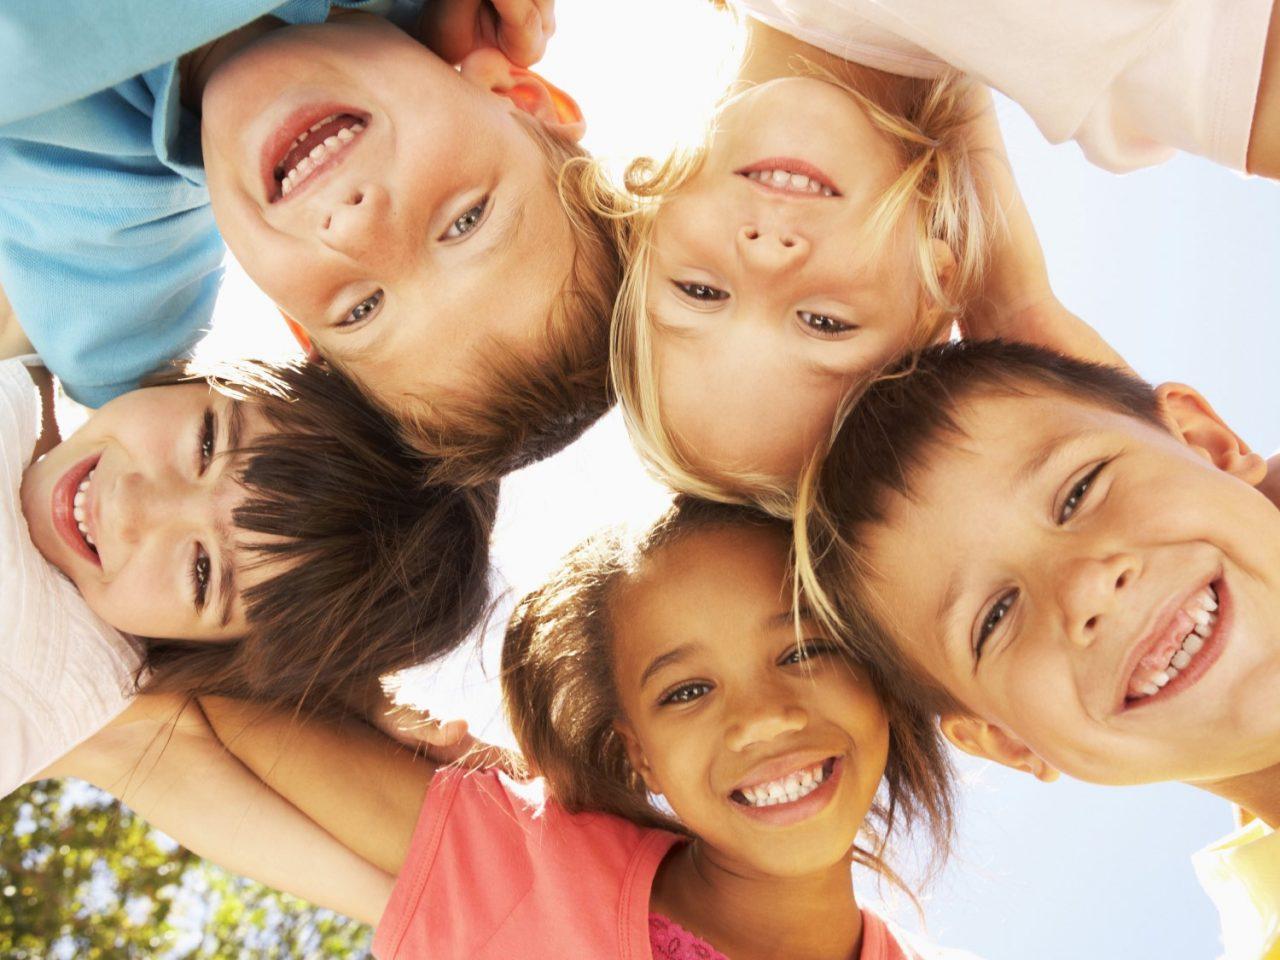 femijet-e-lumtur-1280x960.jpg